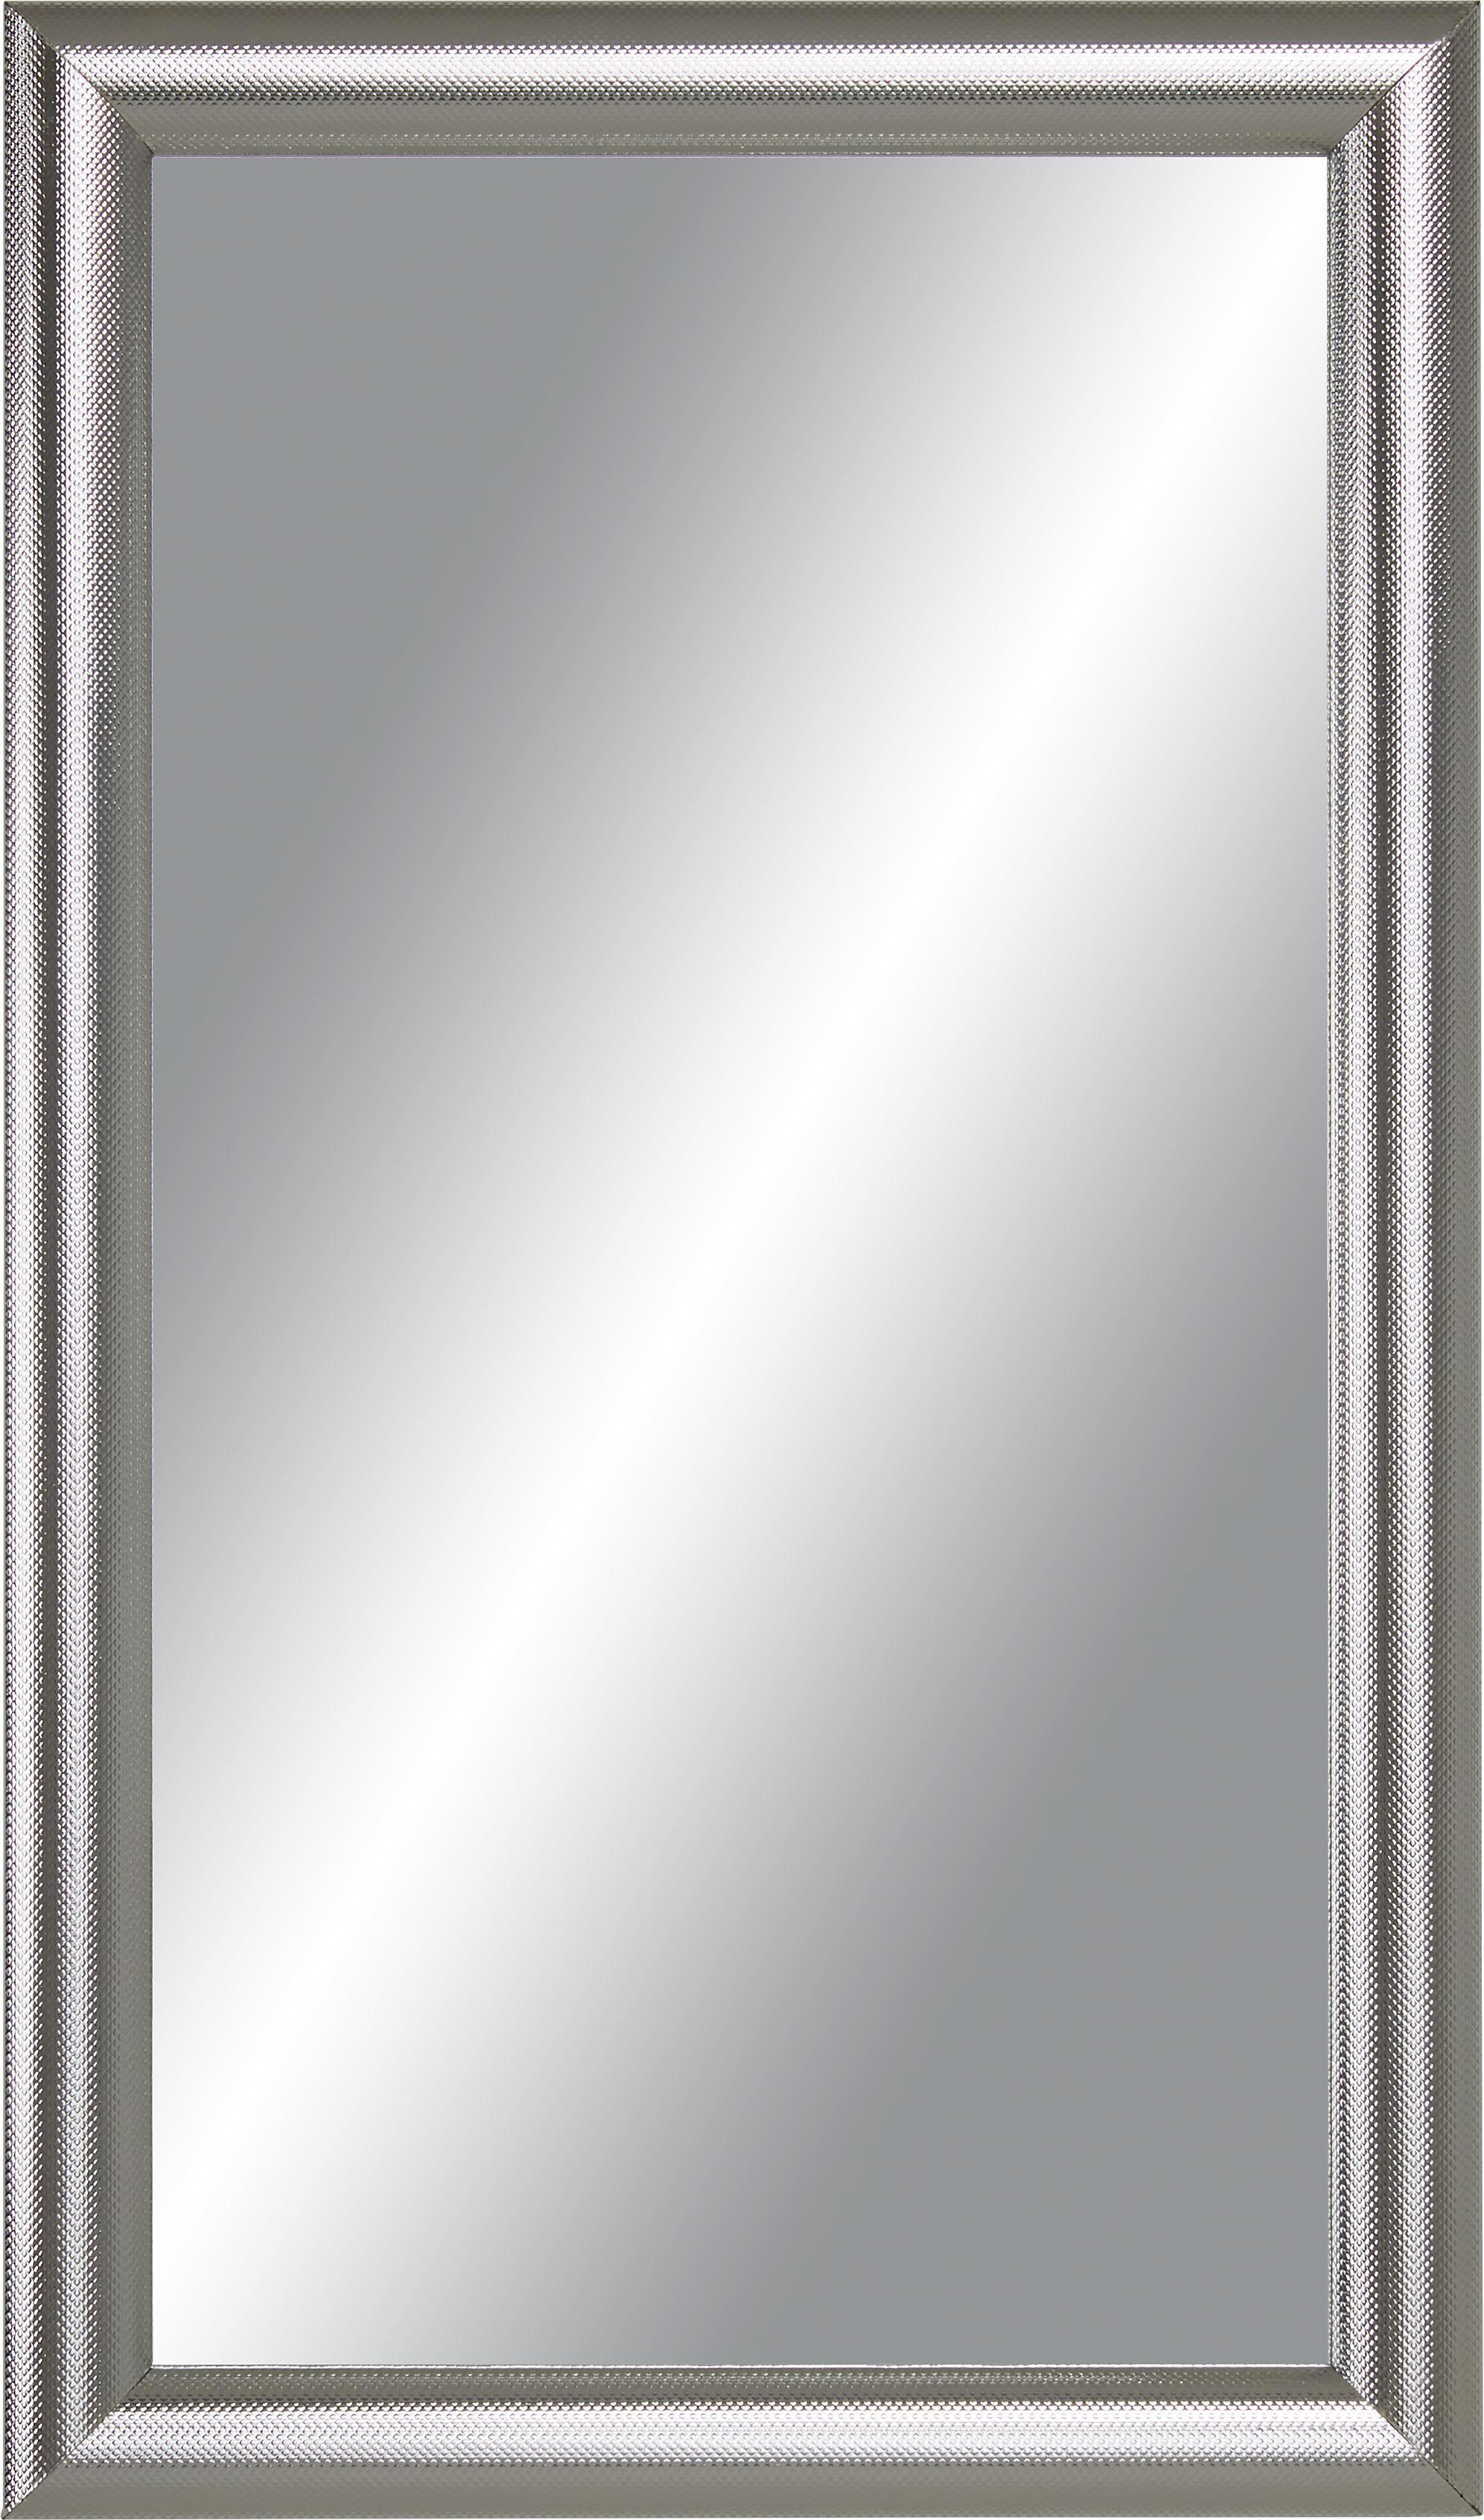 Wandspiegel in Silber, ca. 30x50cm - Silberfarben, MODERN, Glas/Holzwerkstoff (30/50cm) - MÖMAX modern living